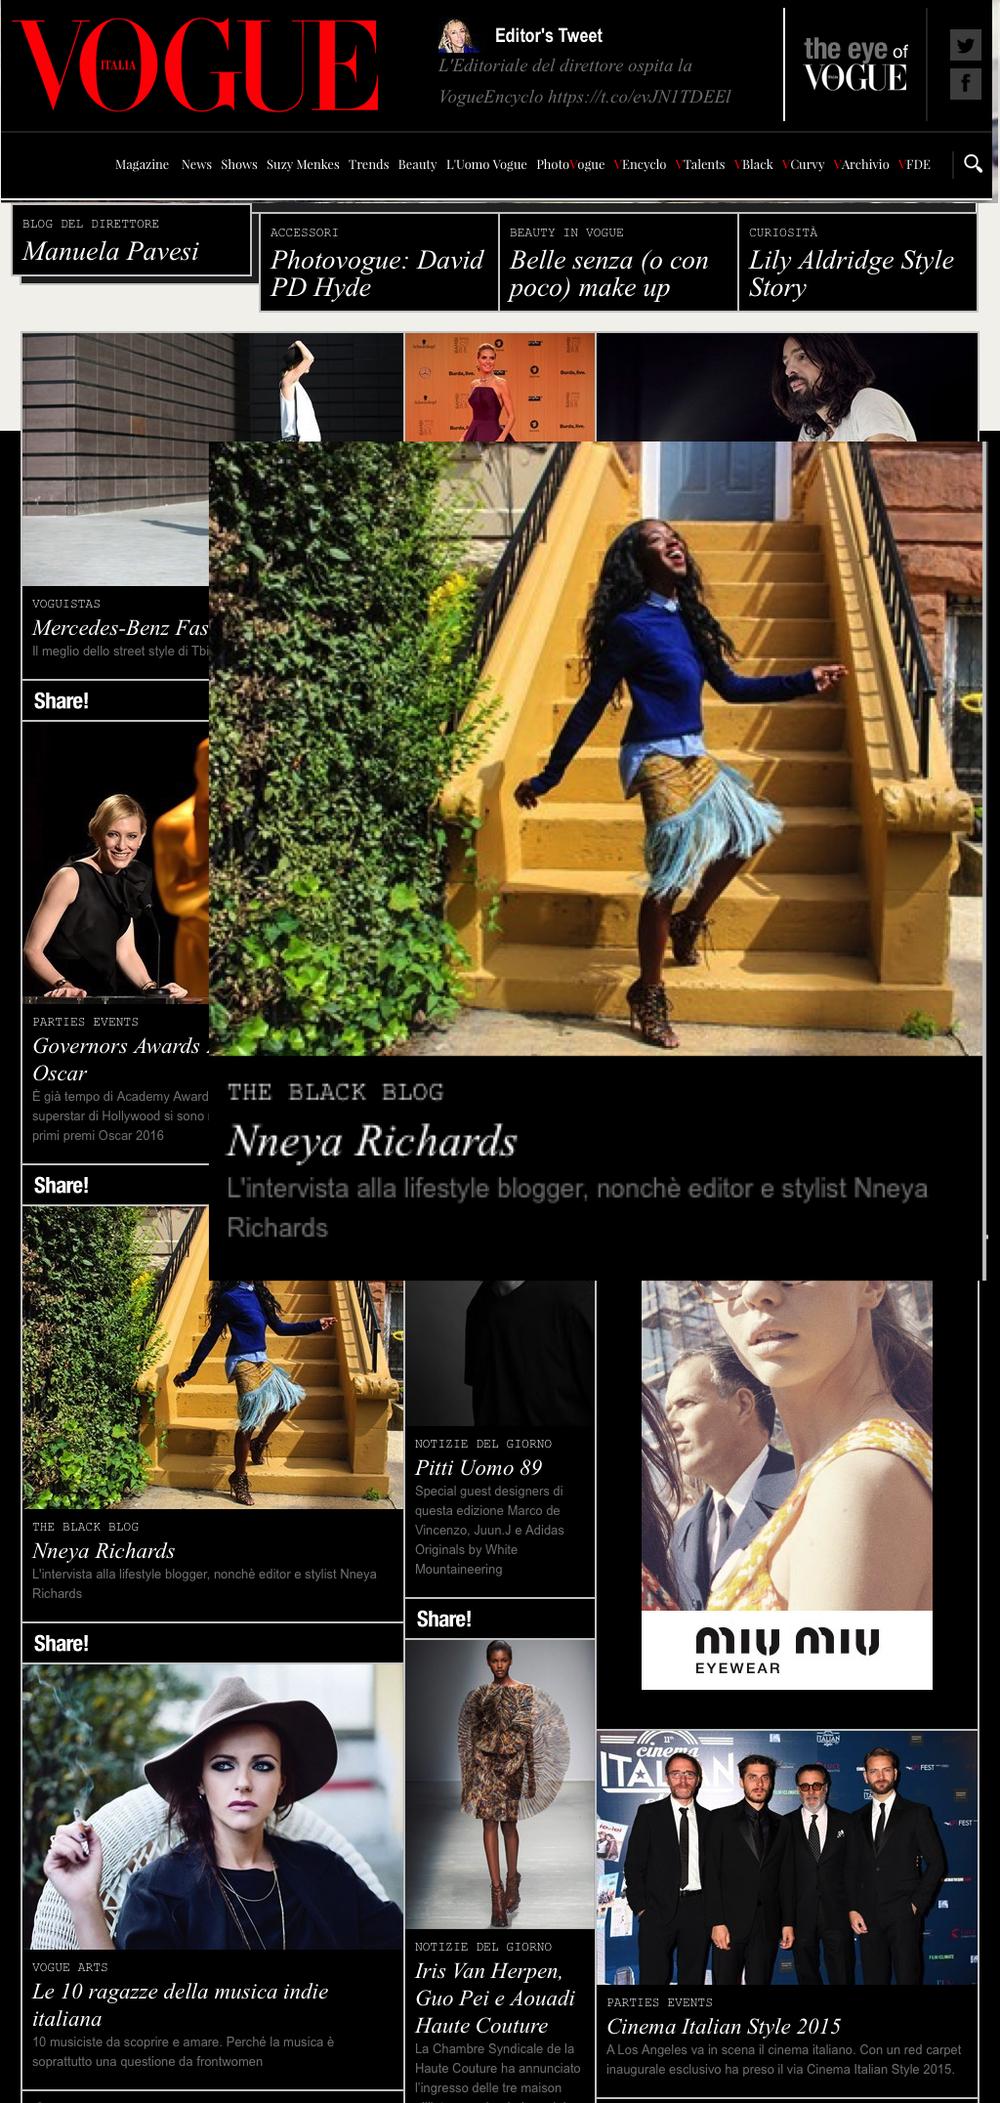 Vogue.it homepage November 2015